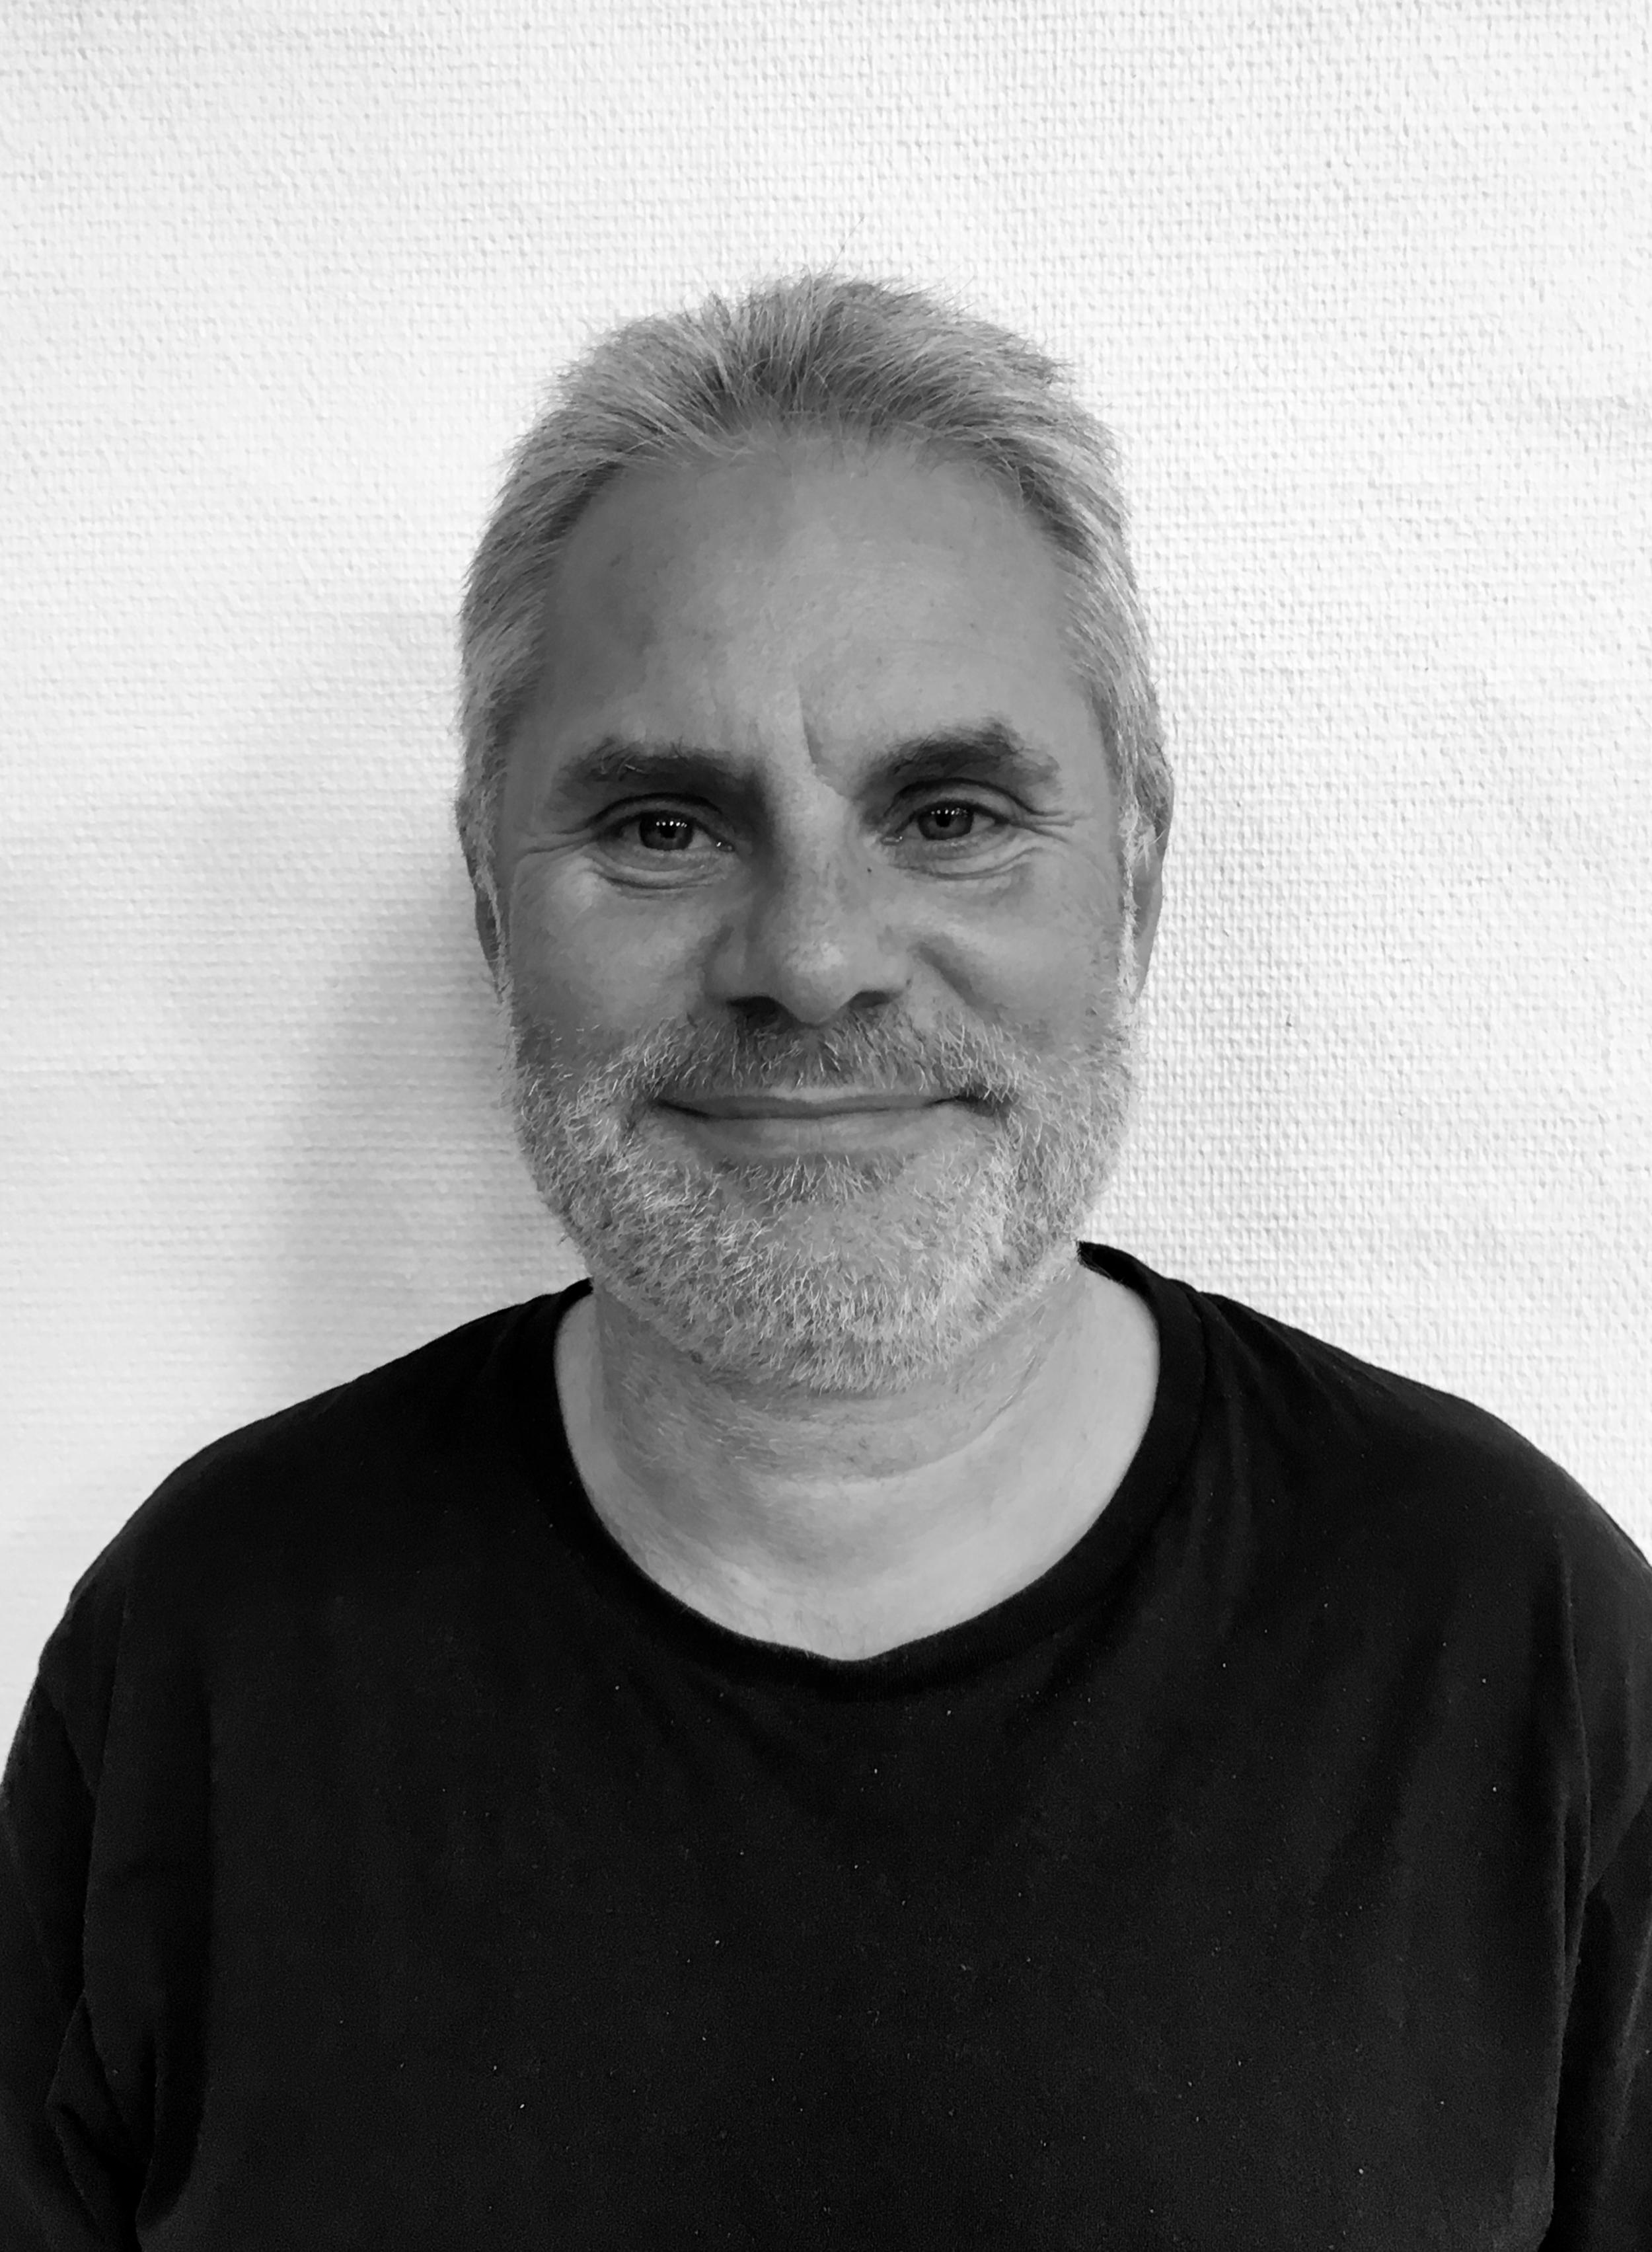 Søren bruun - KLAVER | SAXOFON | KLARINET | TVÆRFLØJTE26 80 44 46SEND EN MAIL▶︎ SE PROFIL